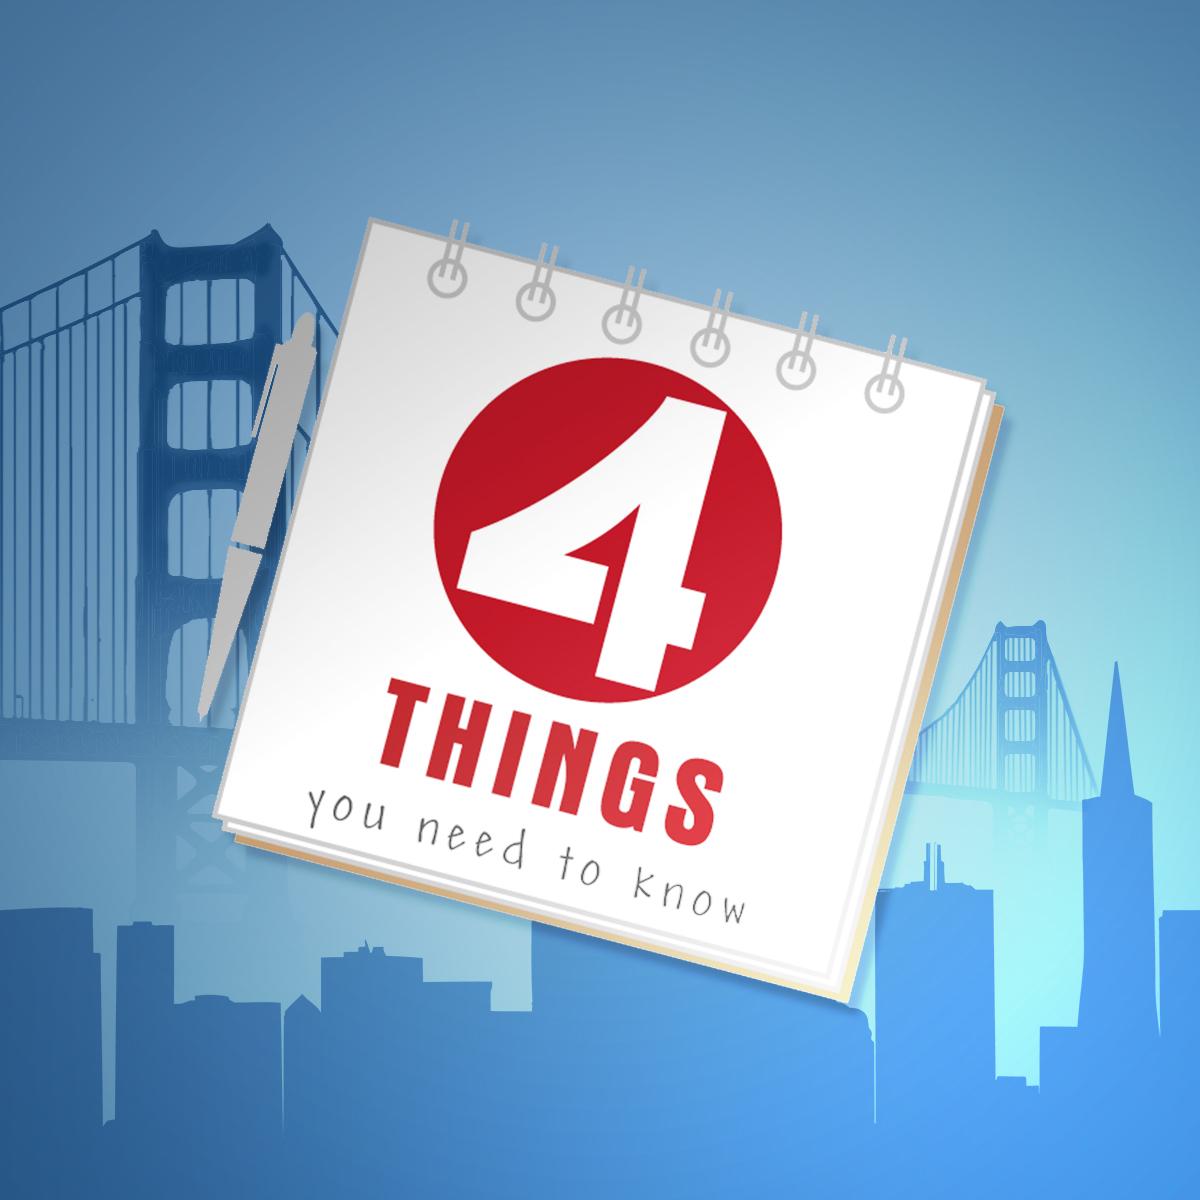 4 Things You Need to Know BG 2_1527019477732.jpg.jpg